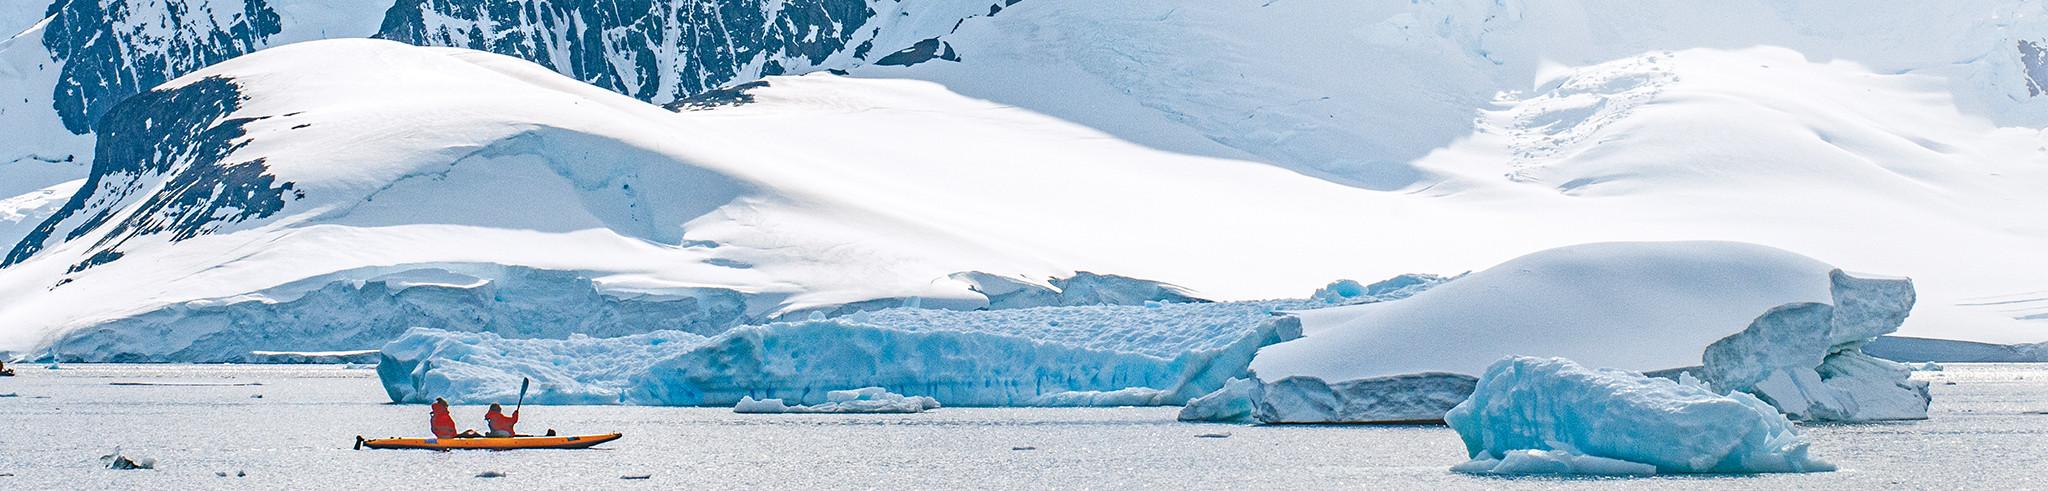 Brownell_Antarctica.jpg